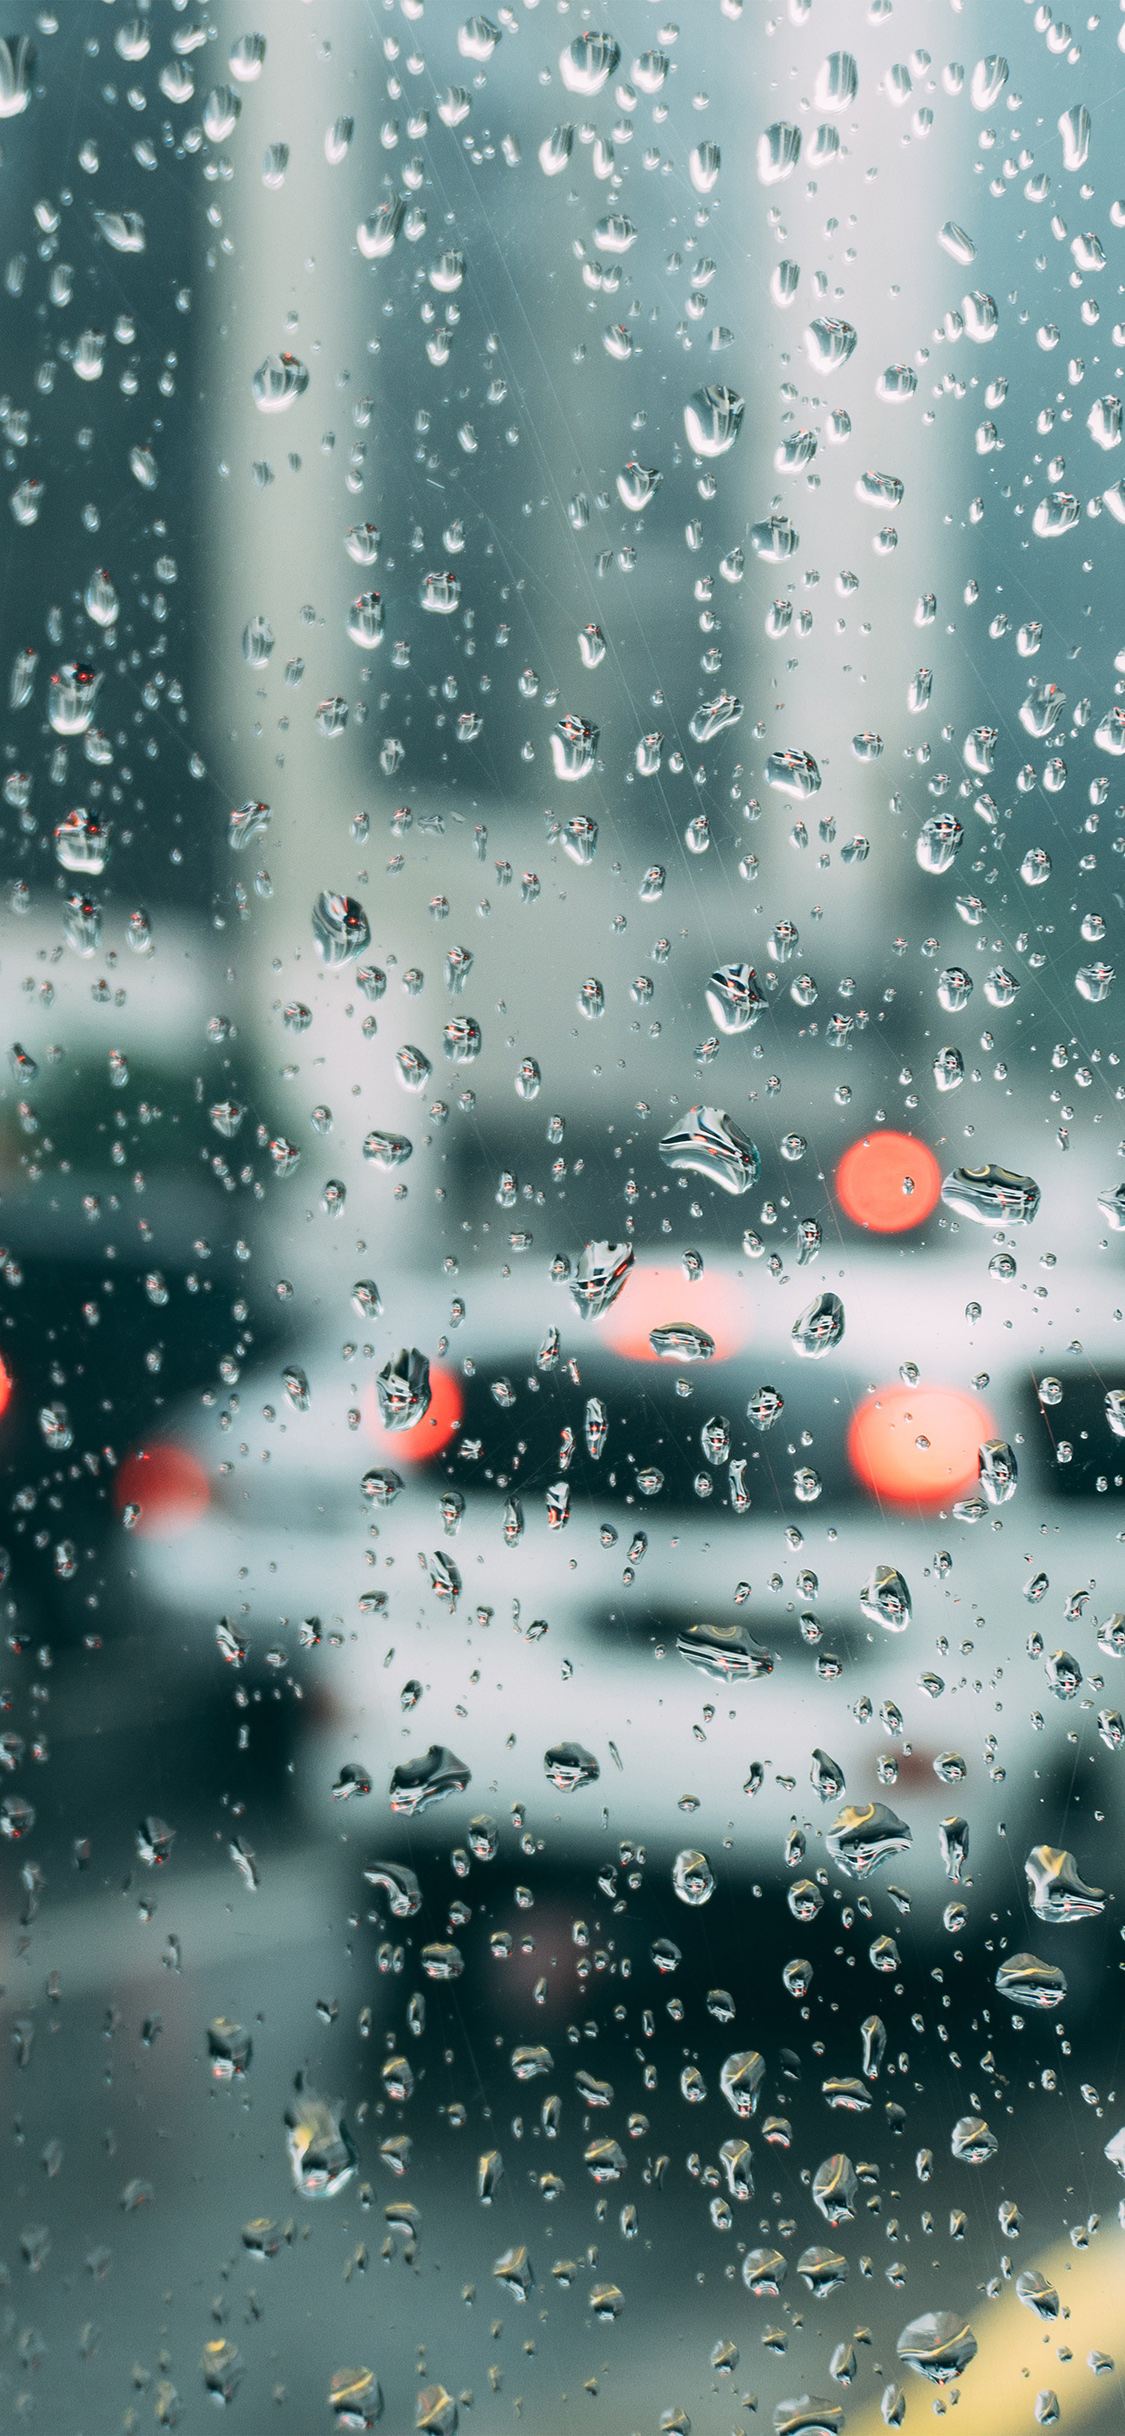 Rain Aesthetic Dark Wallpaper